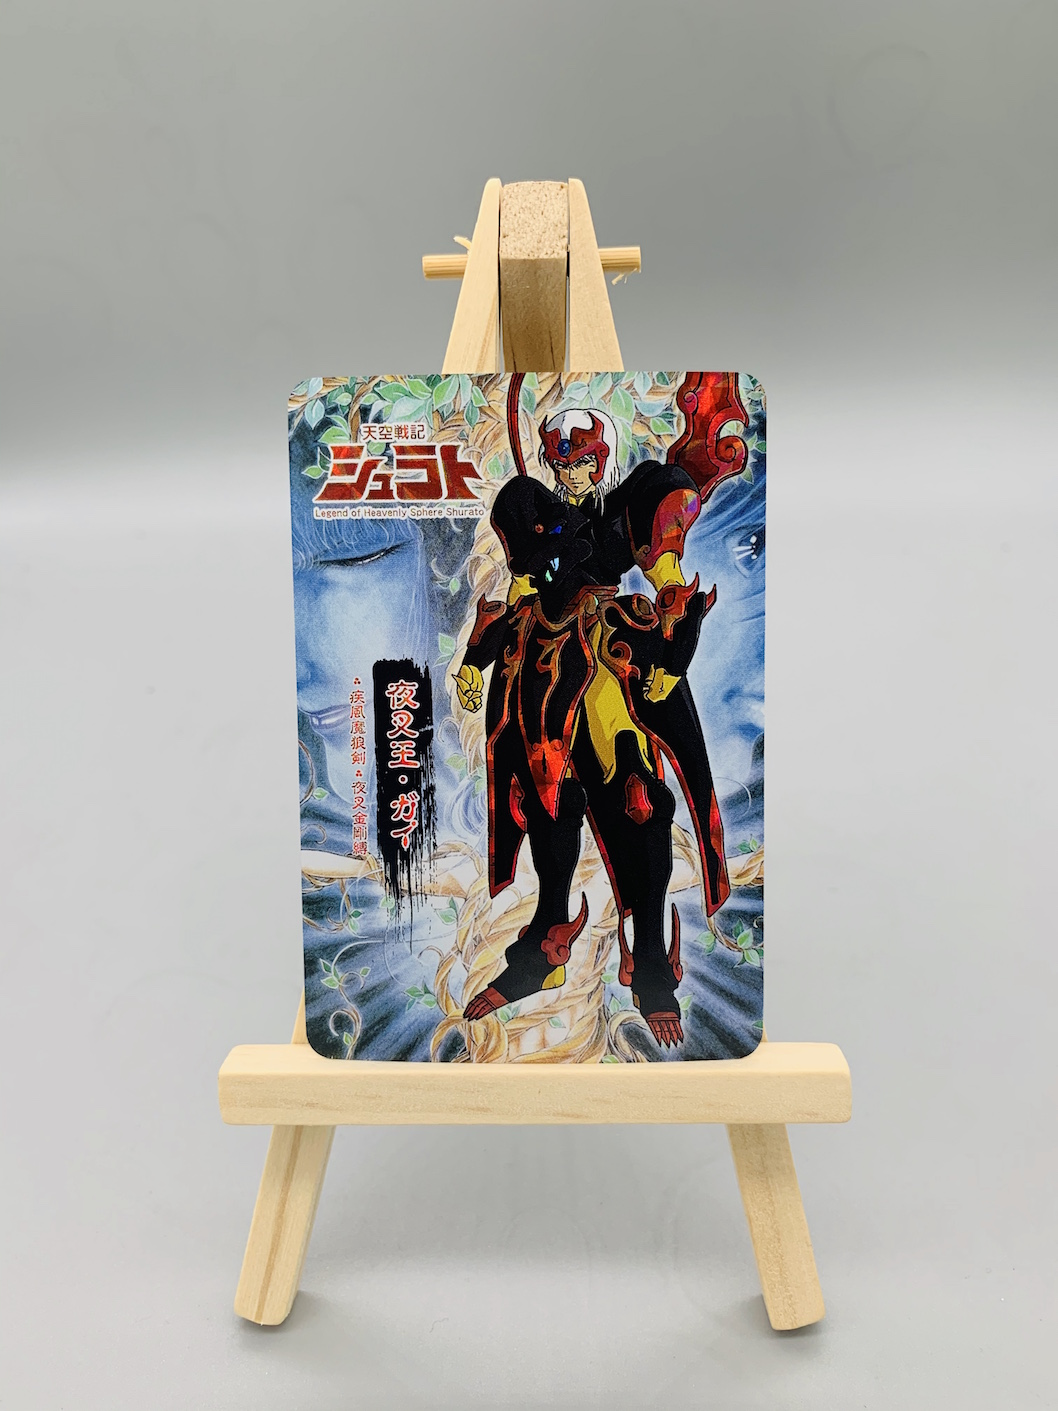 9pcs/set TenKuu Senki Shurato Childhood Memory Toys Hobbies Hobby Collectibles Game Collection Anime Cards